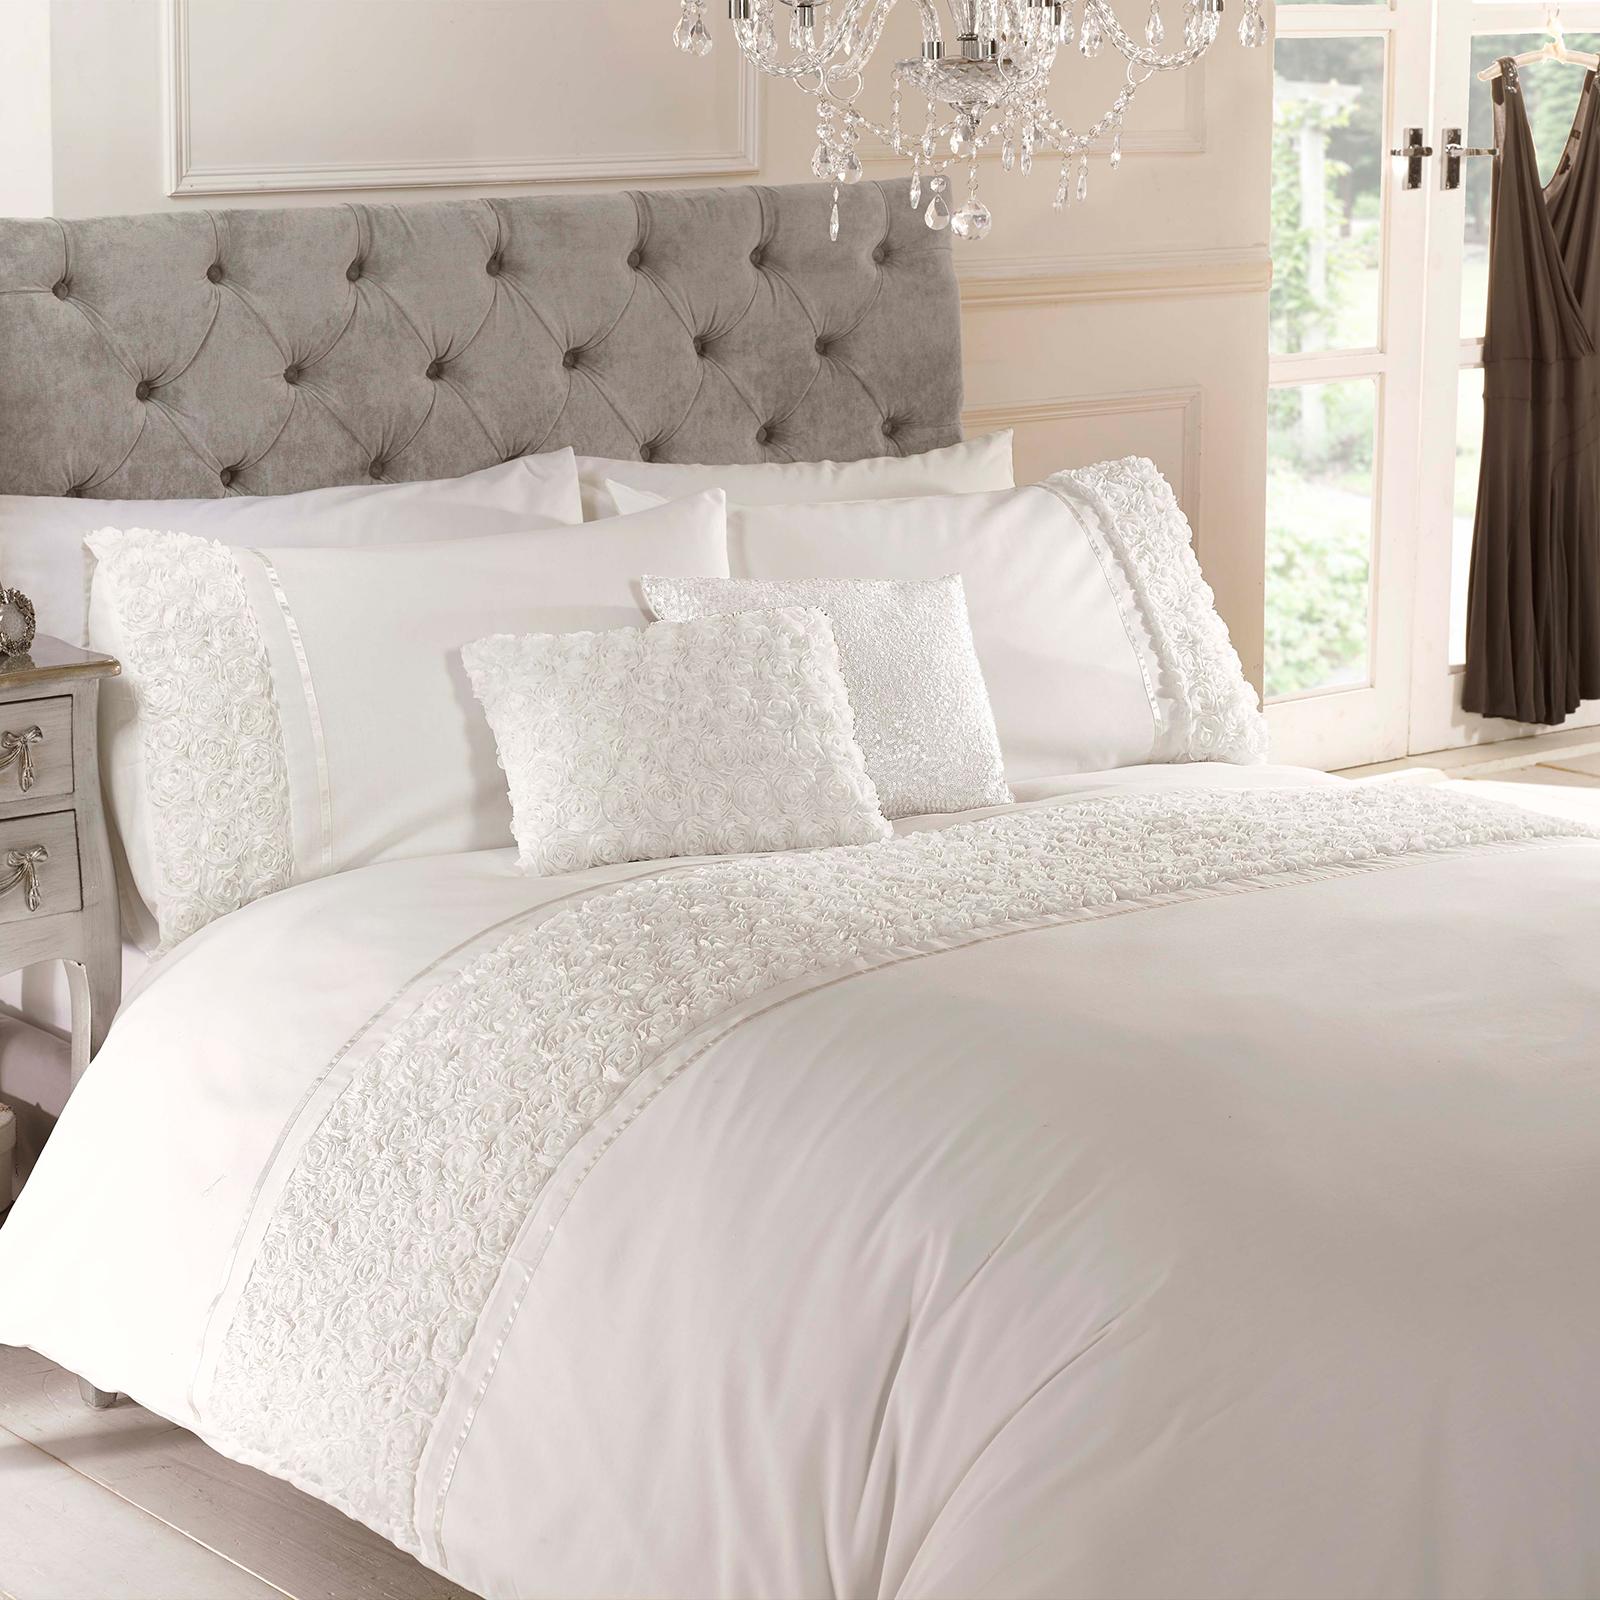 rose floral ruffle duvet quilt cover  vintage chic bedding set   - rosefloralruffleduvetquiltcovervintagechic